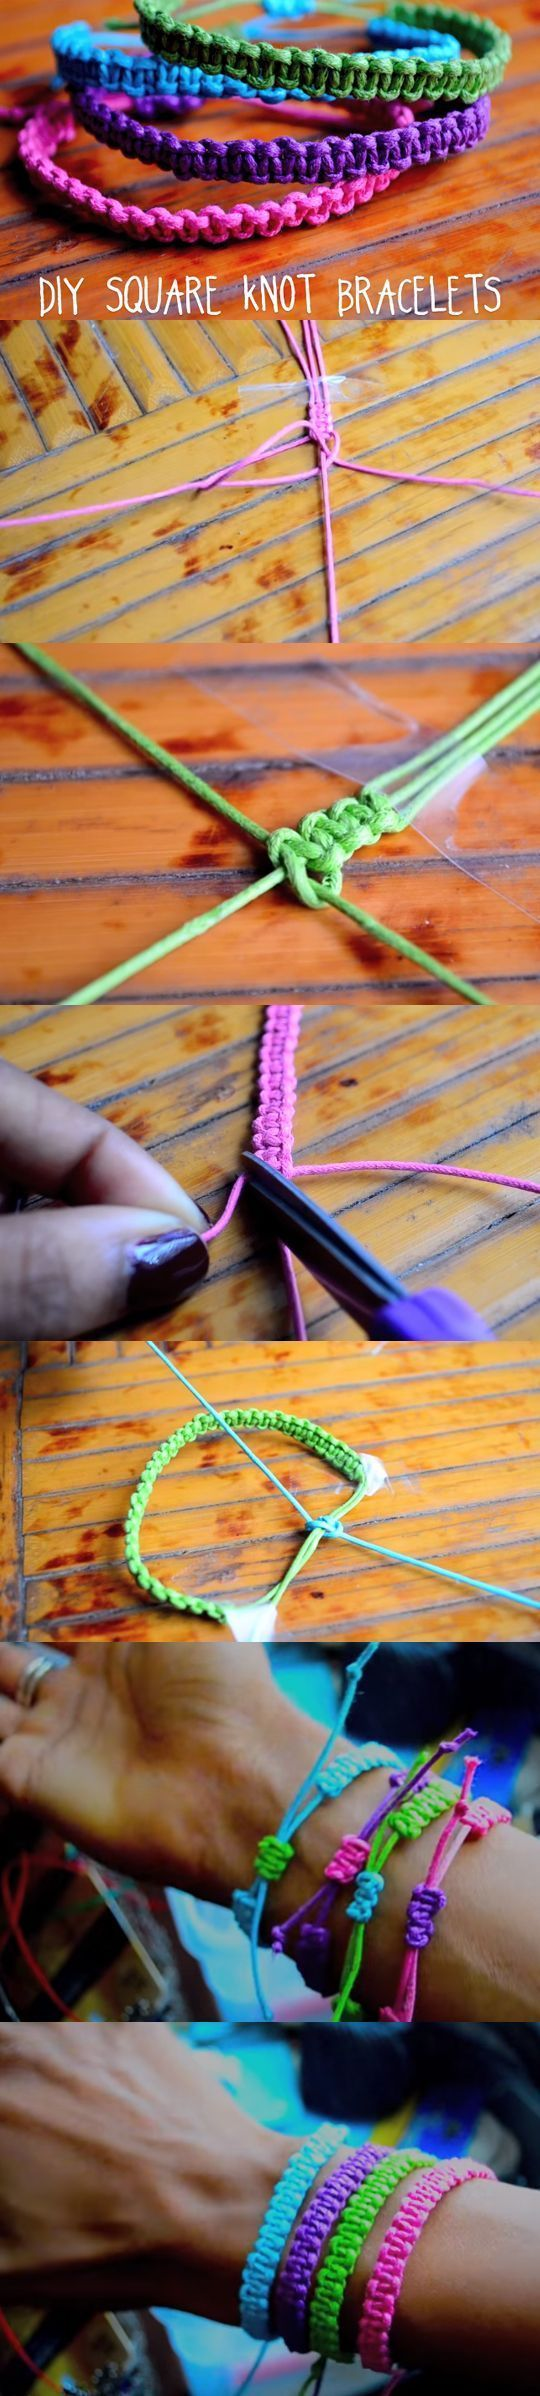 Easy To Make Square Knot Bracelets